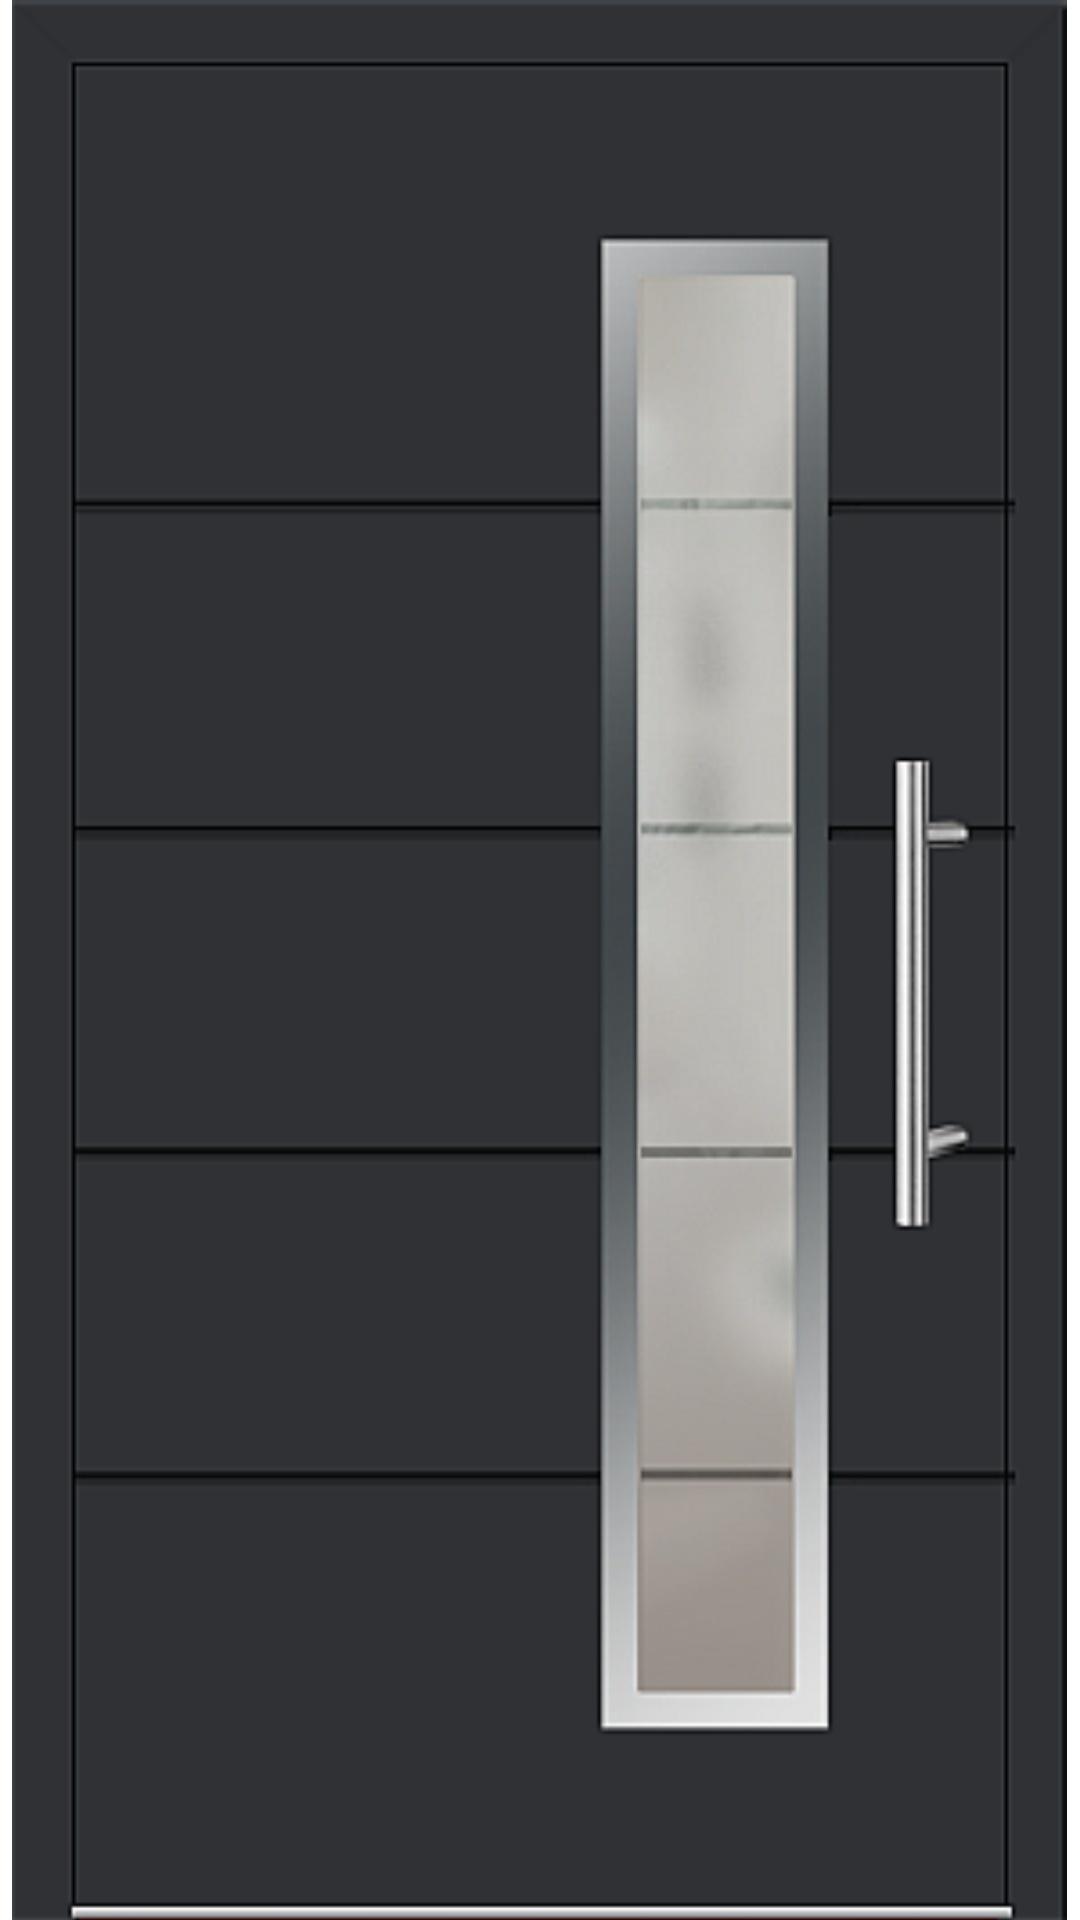 Aluminium Haustür Modell 6848-72 schwarz